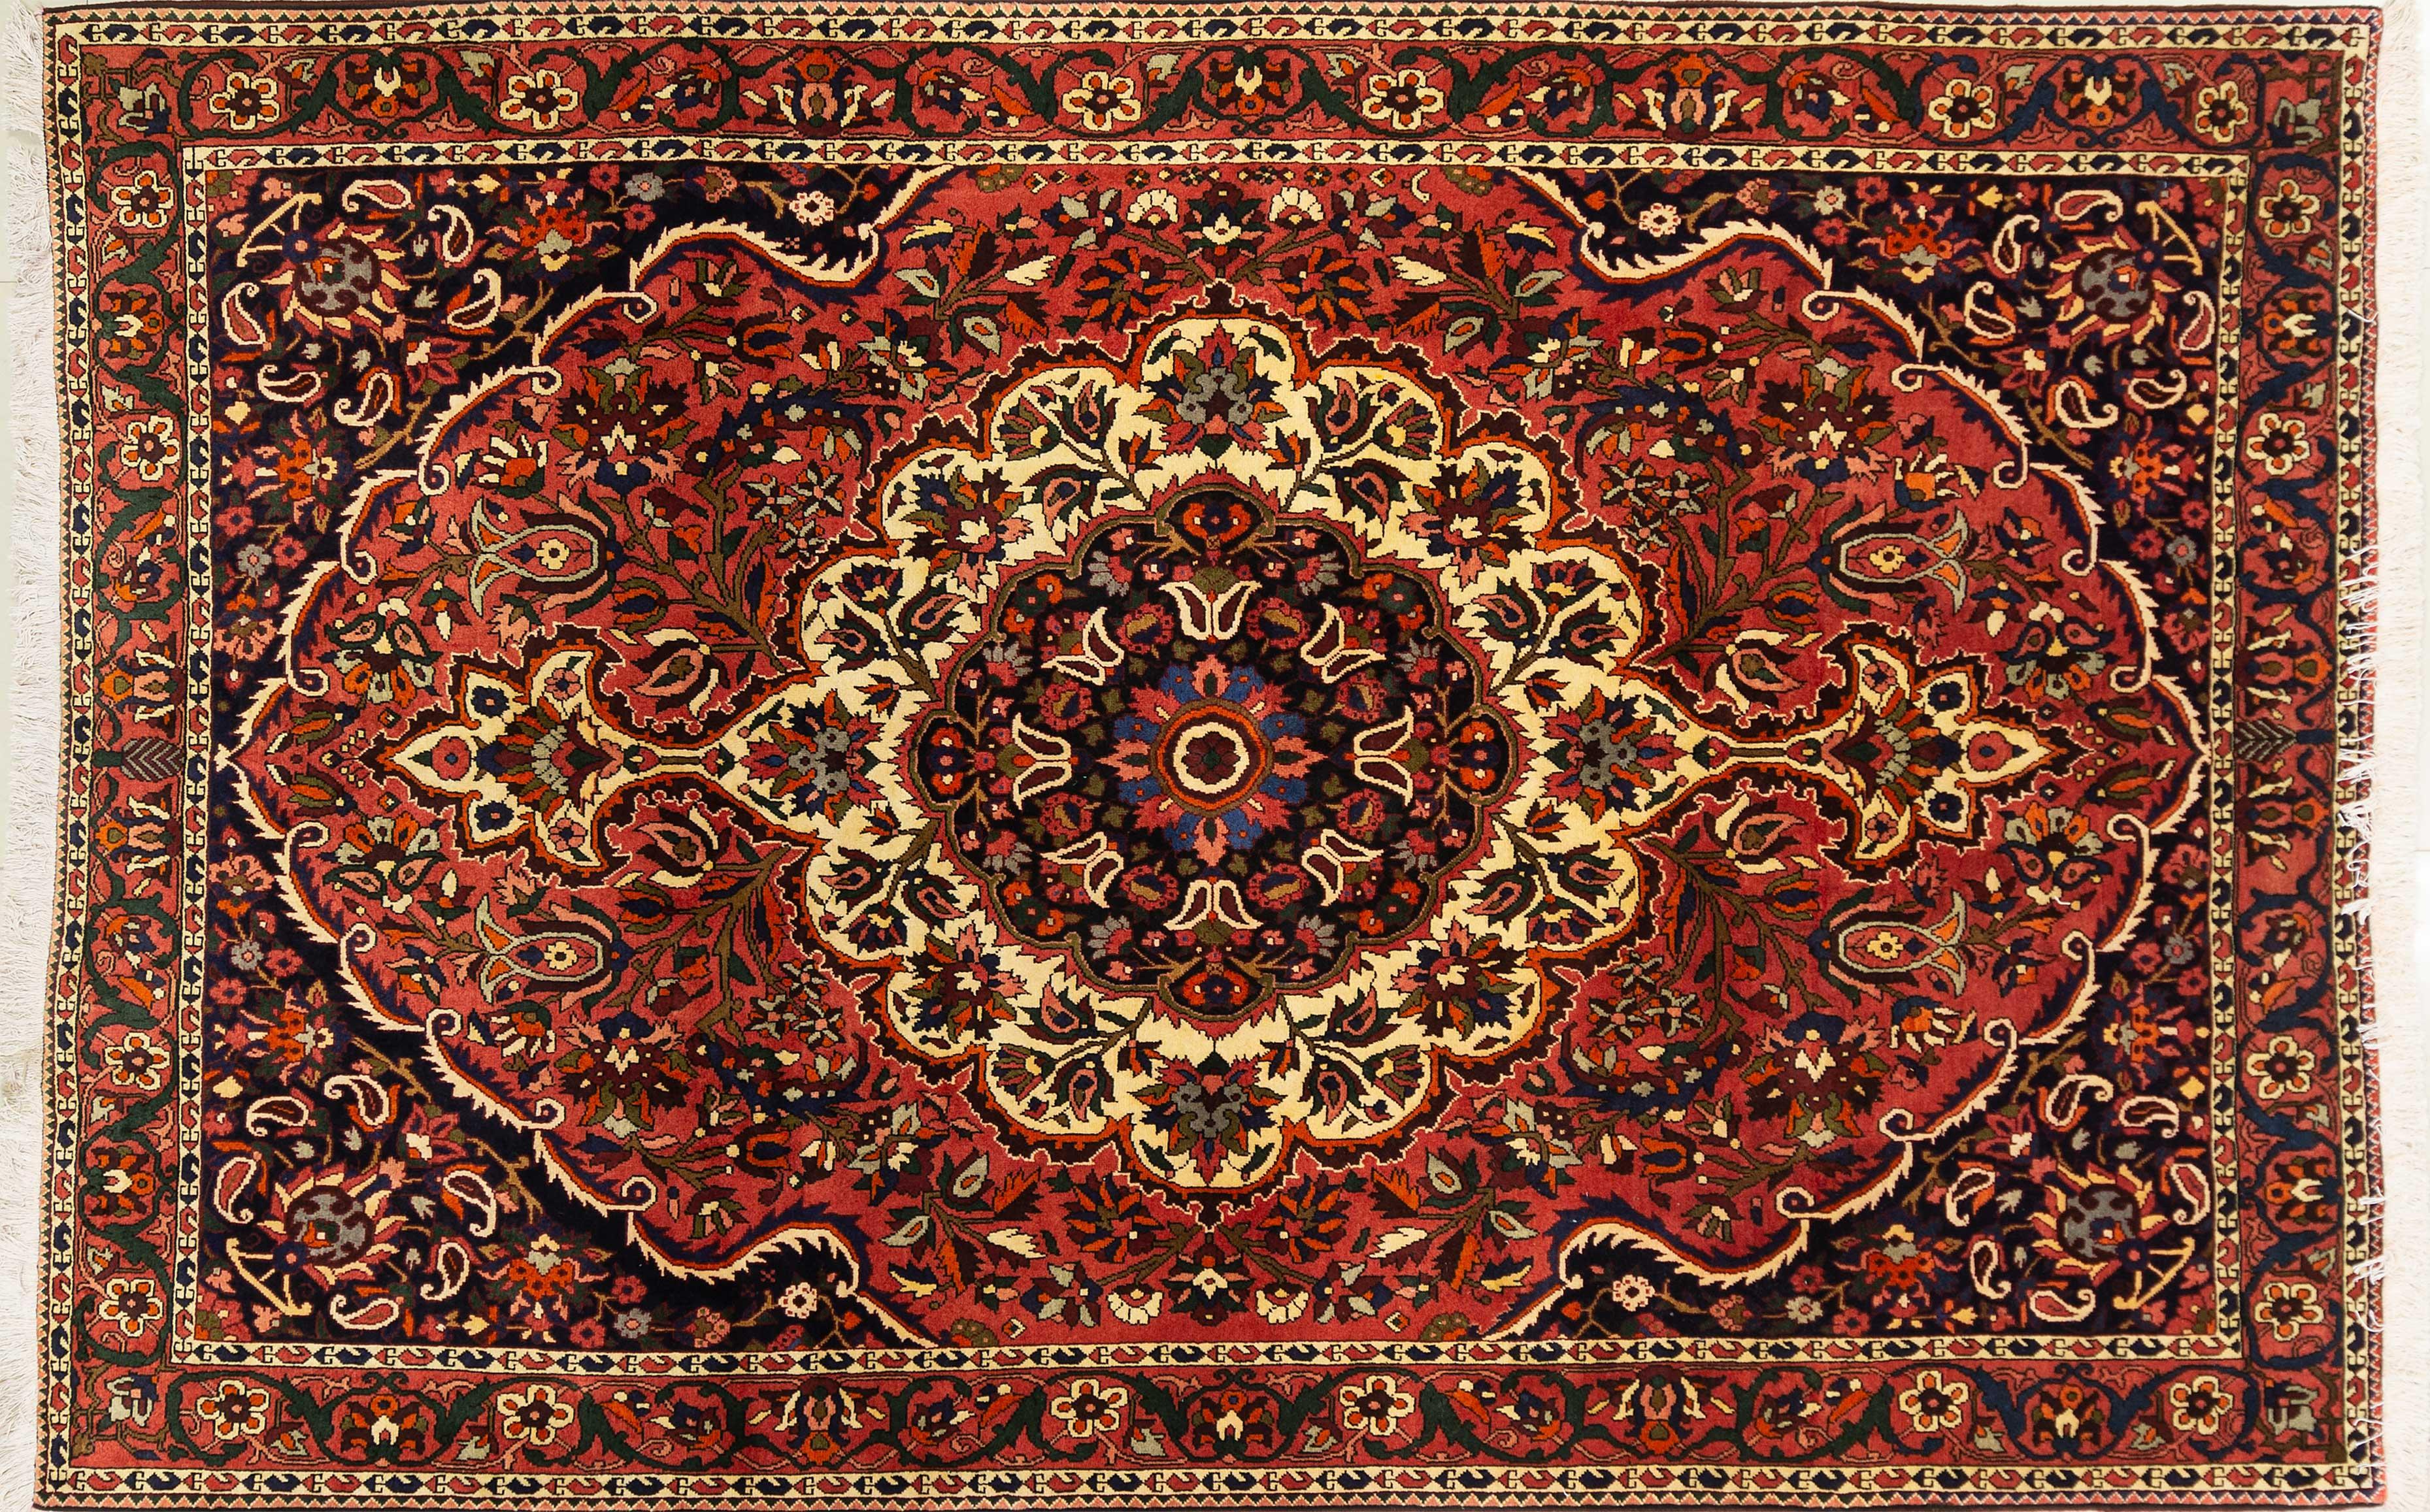 A Persian Hand Knotted Bakhtiari Carpet, 315 x 207